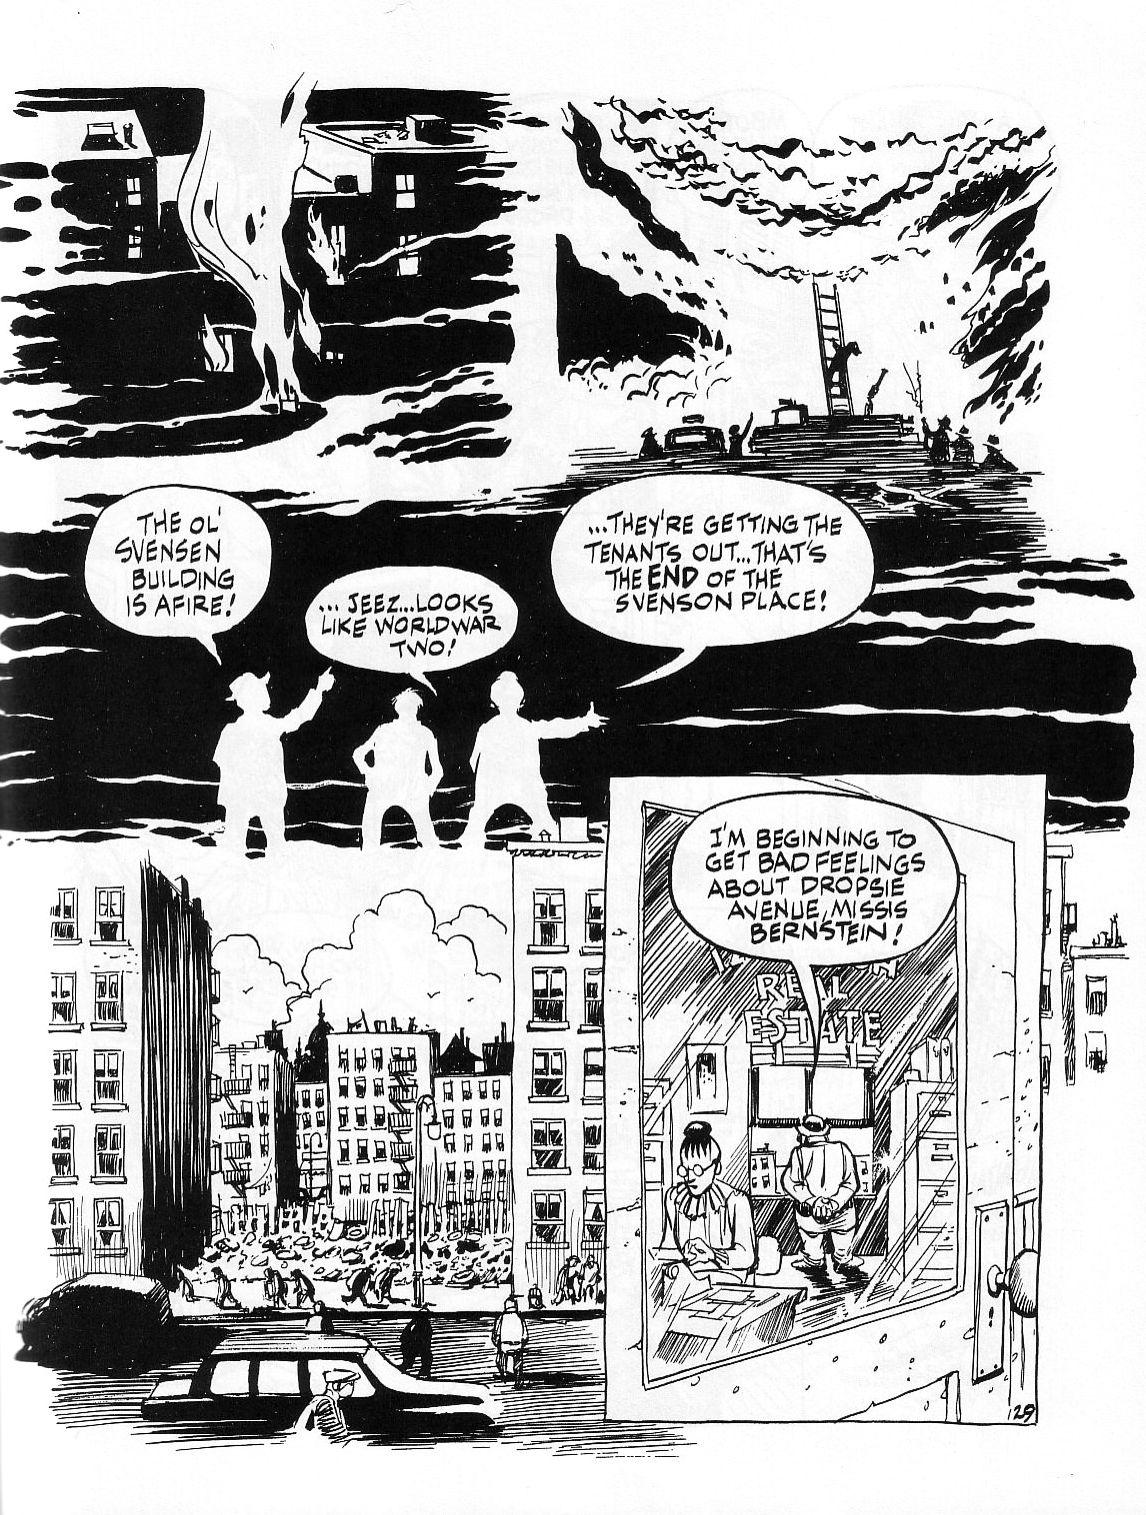 Read online Dropsie Avenue, The Neighborhood comic -  Issue # Full - 131